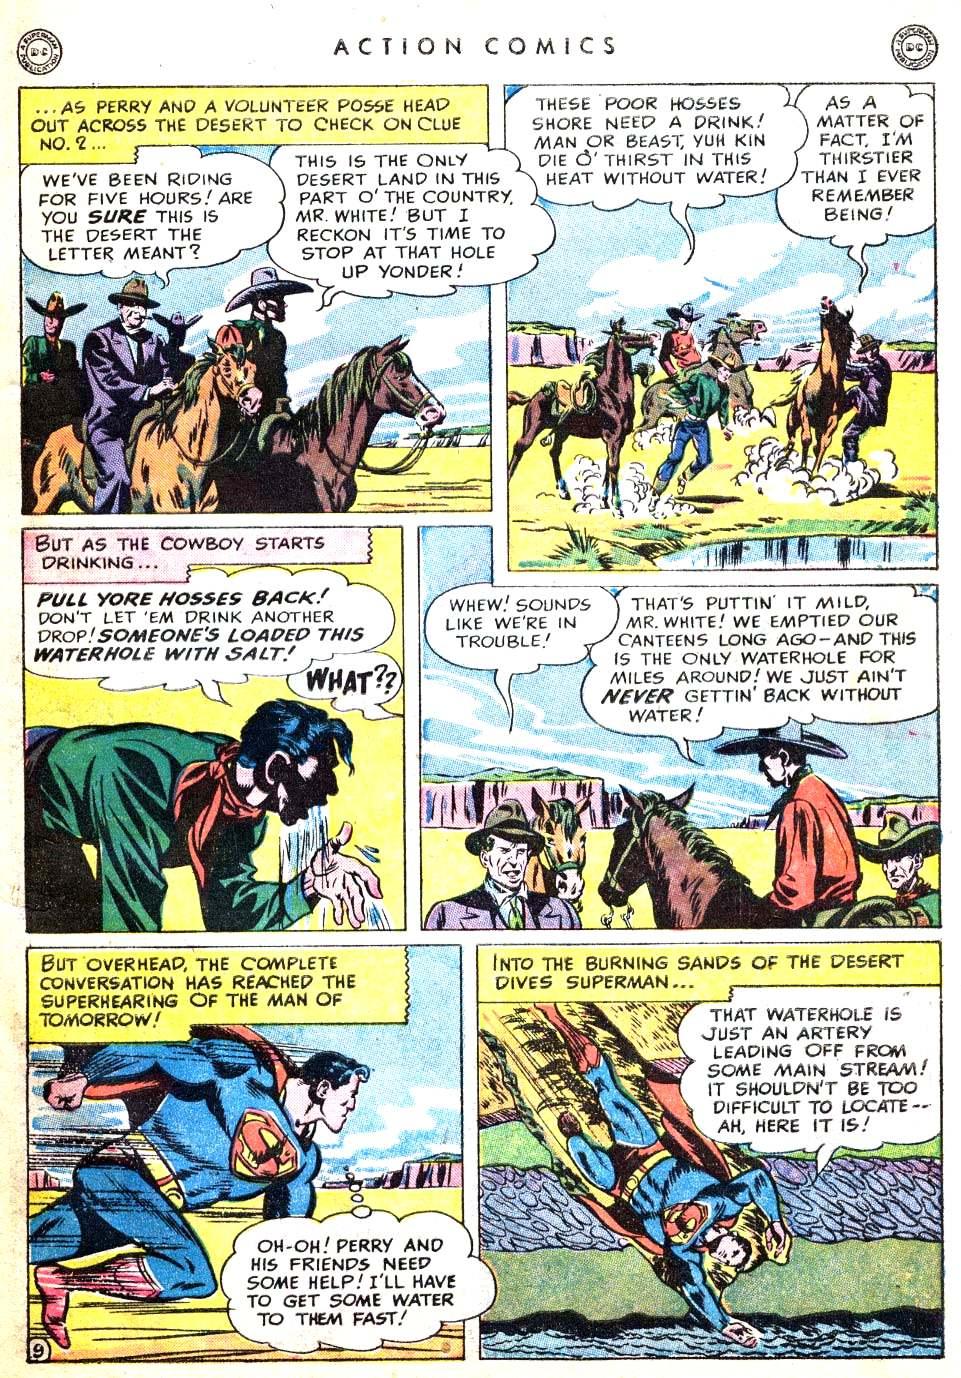 Action Comics (1938) 134 Page 10